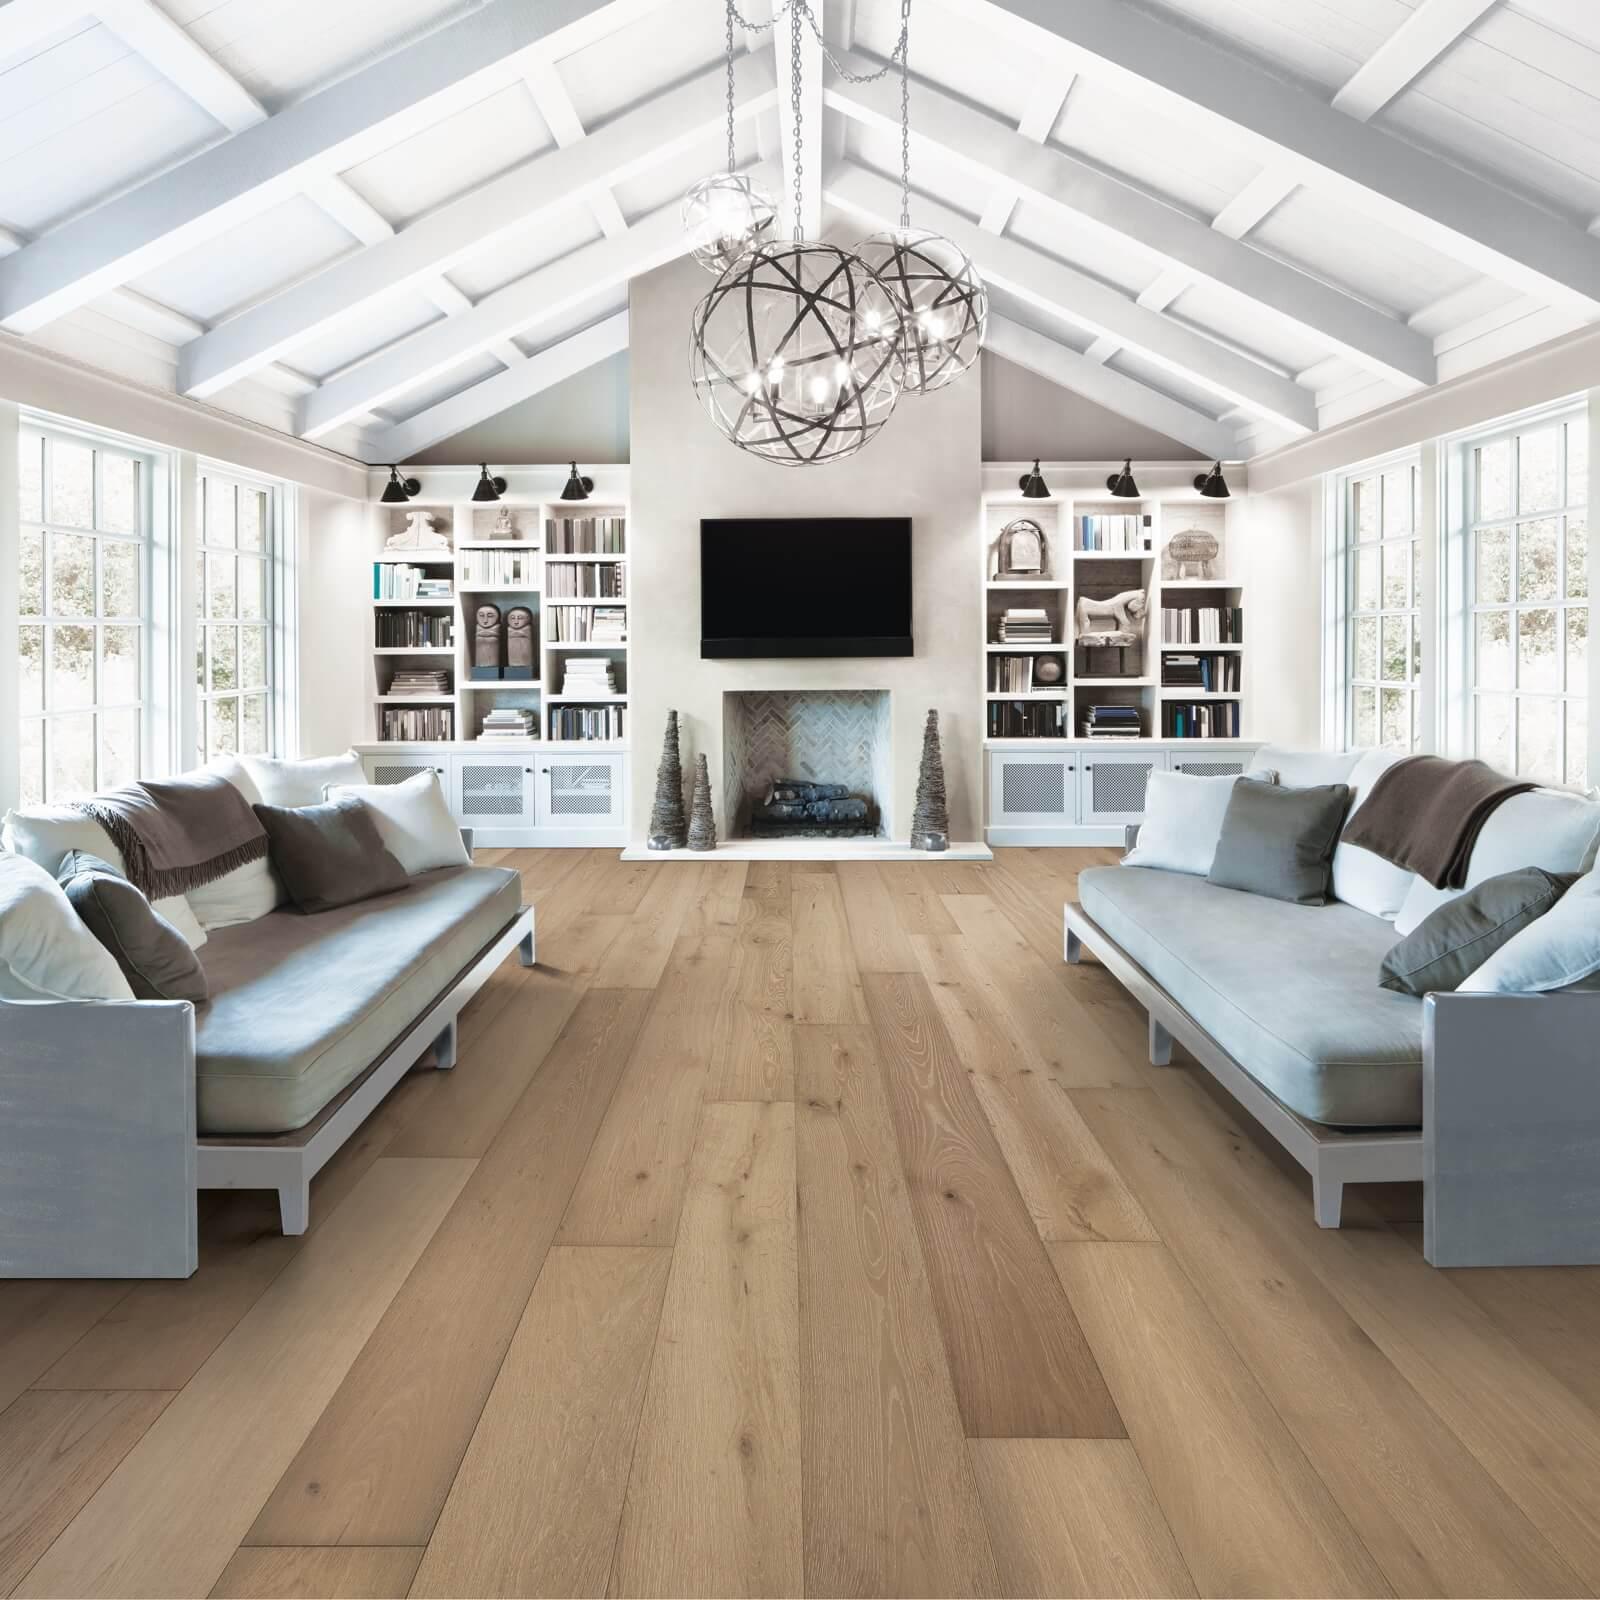 Mont Blanc Room with hardwood flooring   Elite Builder Services